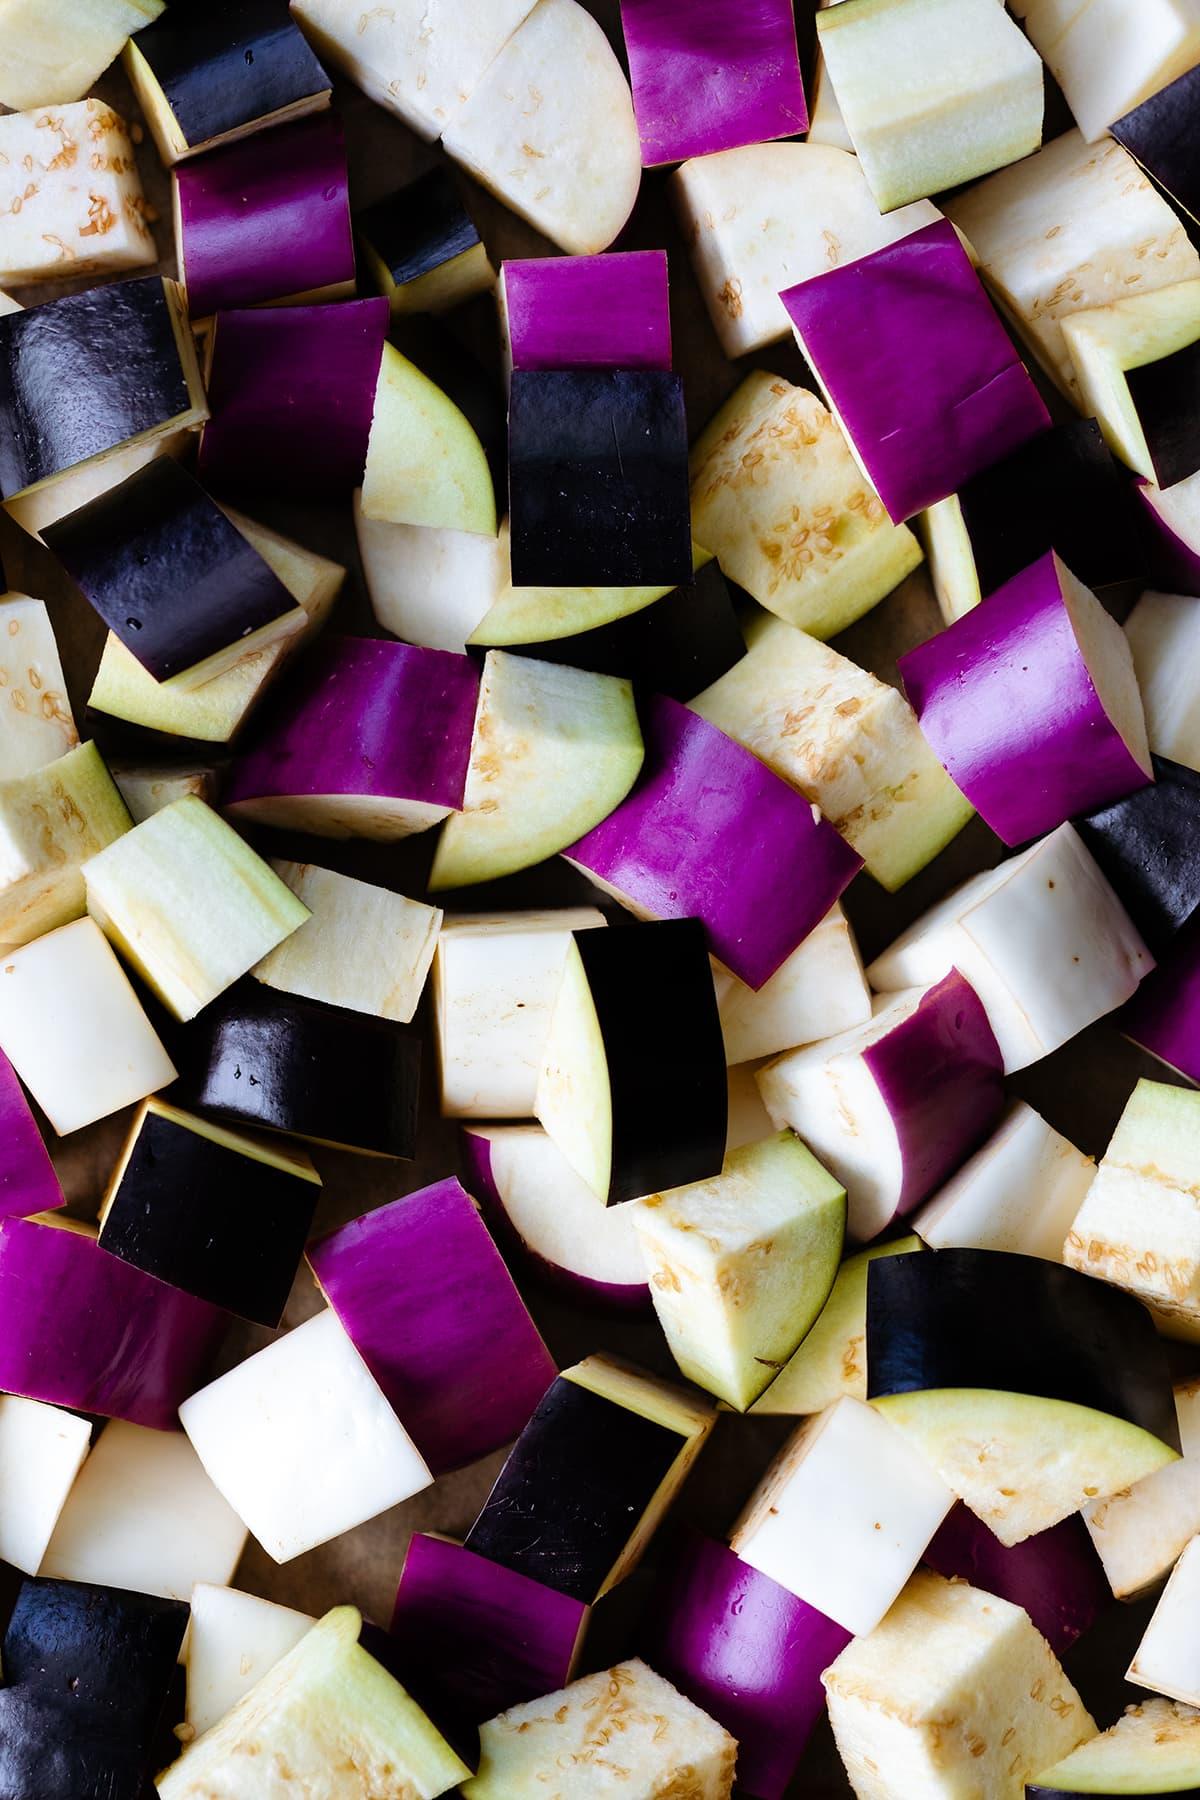 Diced eggplant (three different colors - dark purple, light purple, and white)